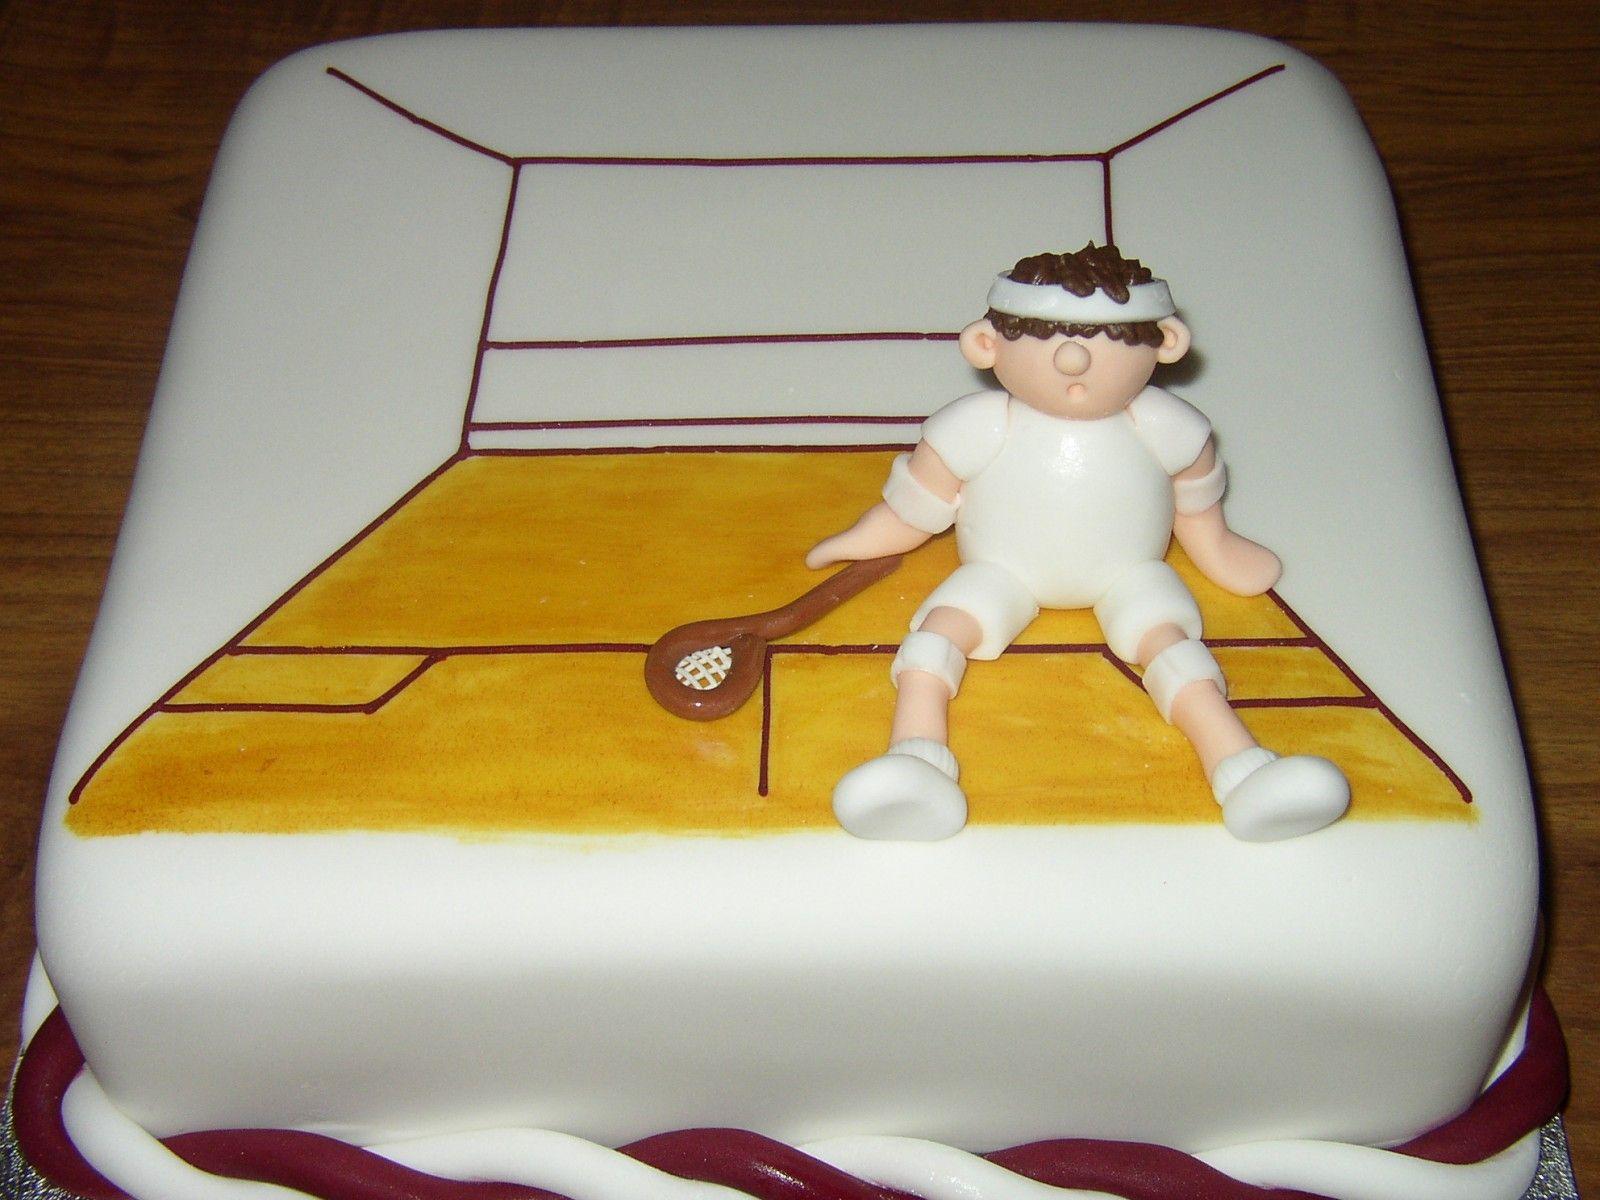 5 Squash Court And Player Novelty Birthday Cake